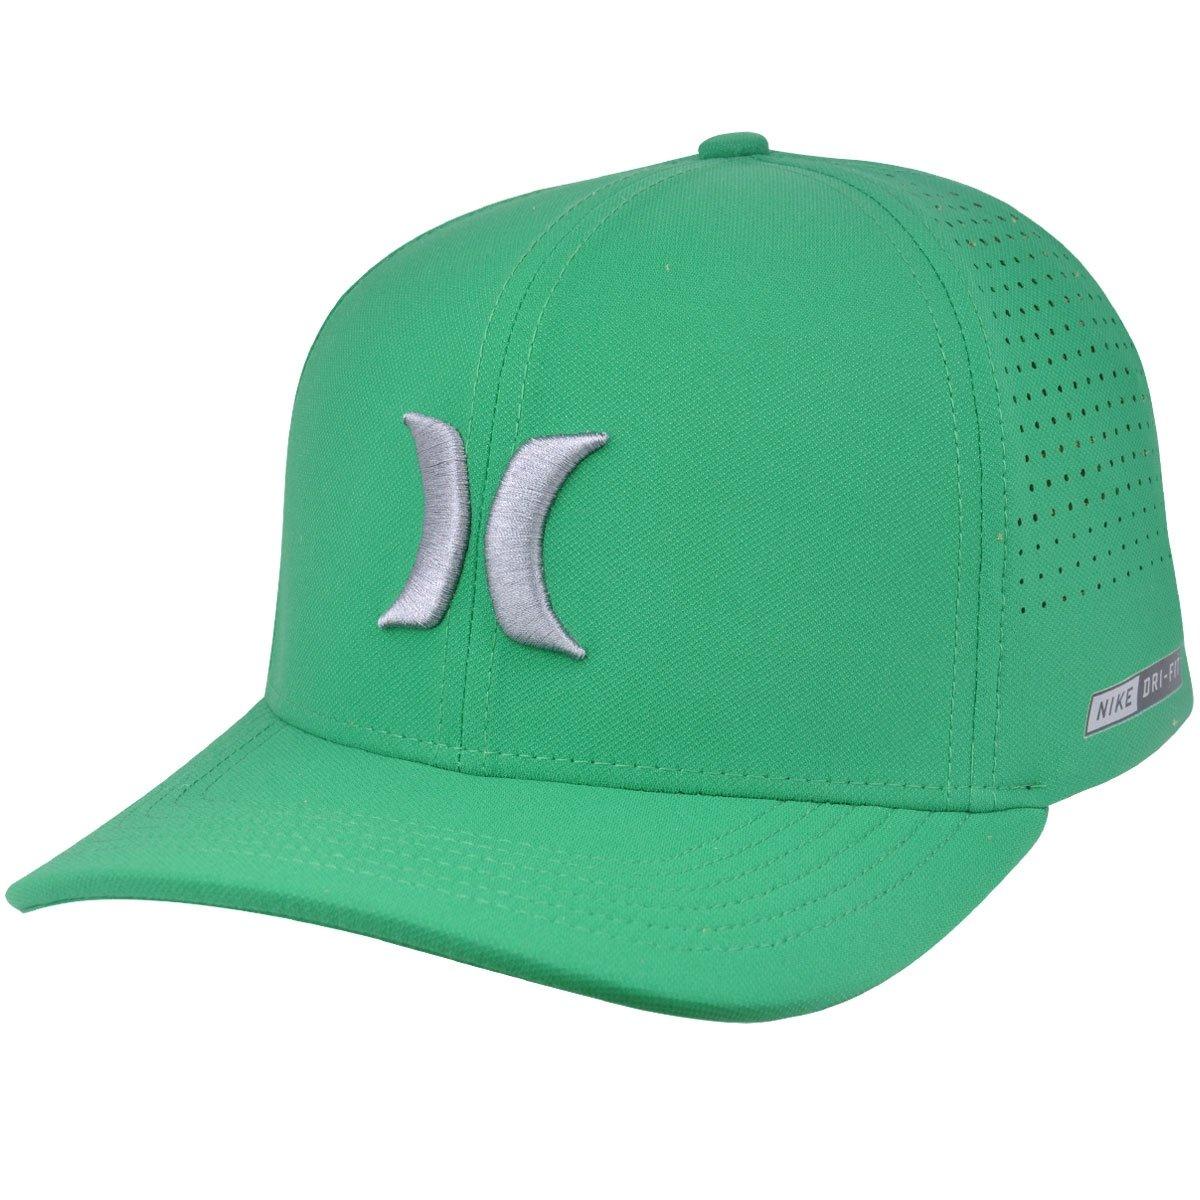 tênis fi a inea 2.0 compre agora netshoes 9ee5d17b3741a6 - mtvnewsbd.com faa5da1753